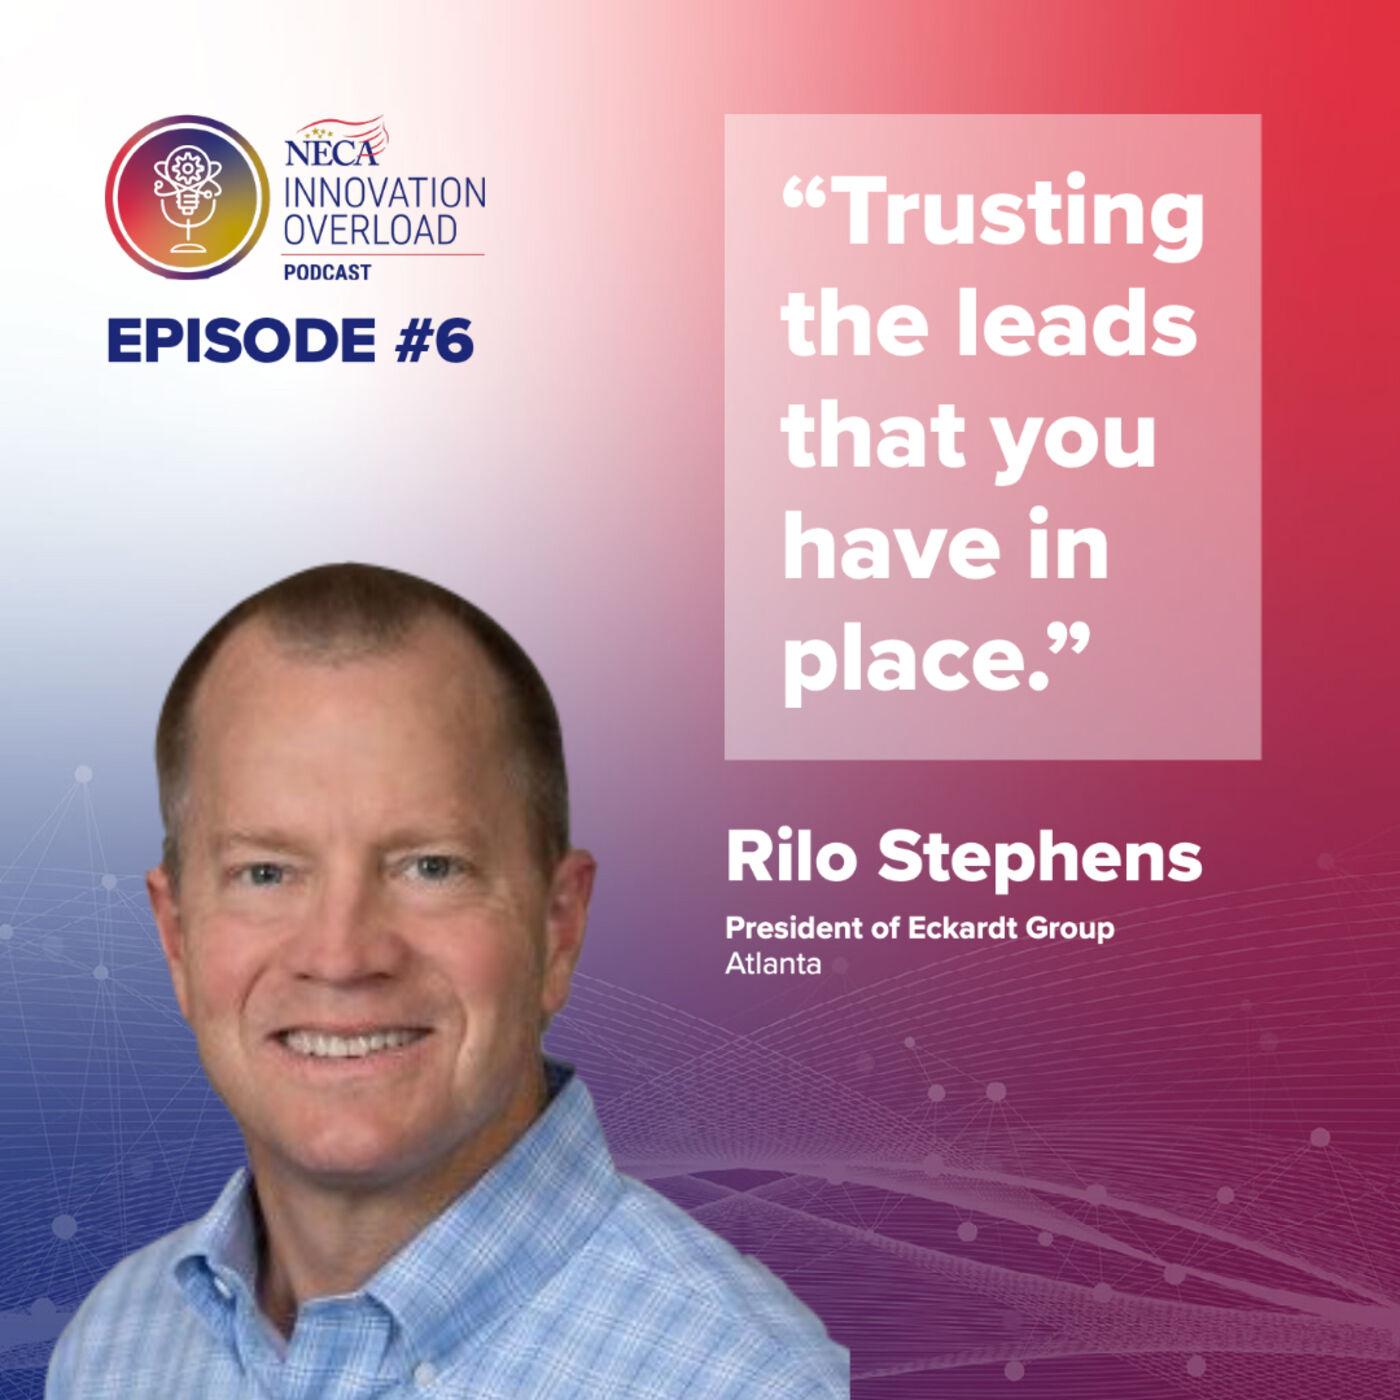 #6 - Rilo Stephens